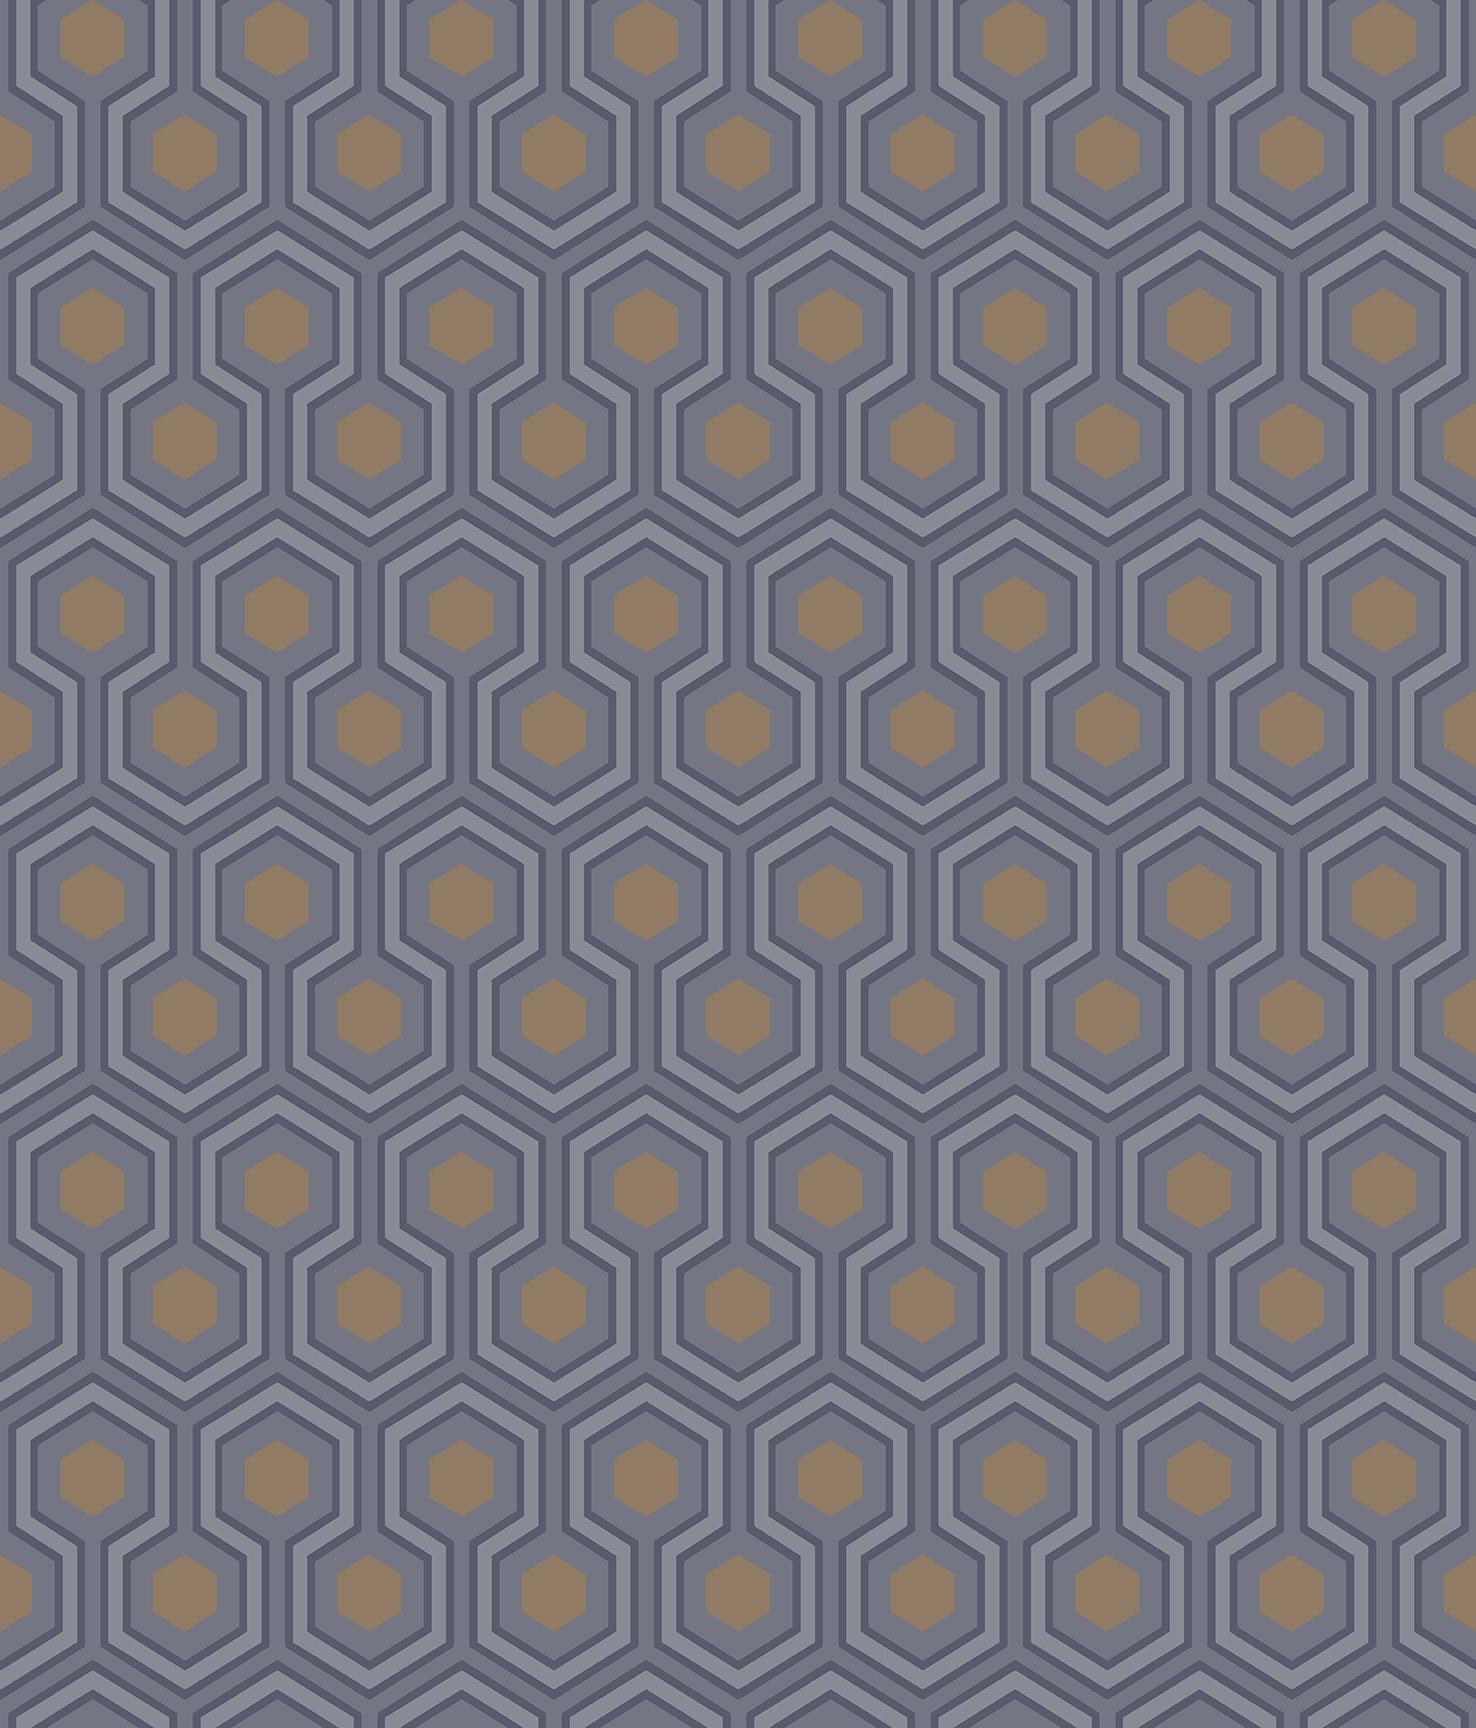 Download Grey Wallpaper Hd Backgrounds Download Itlcat